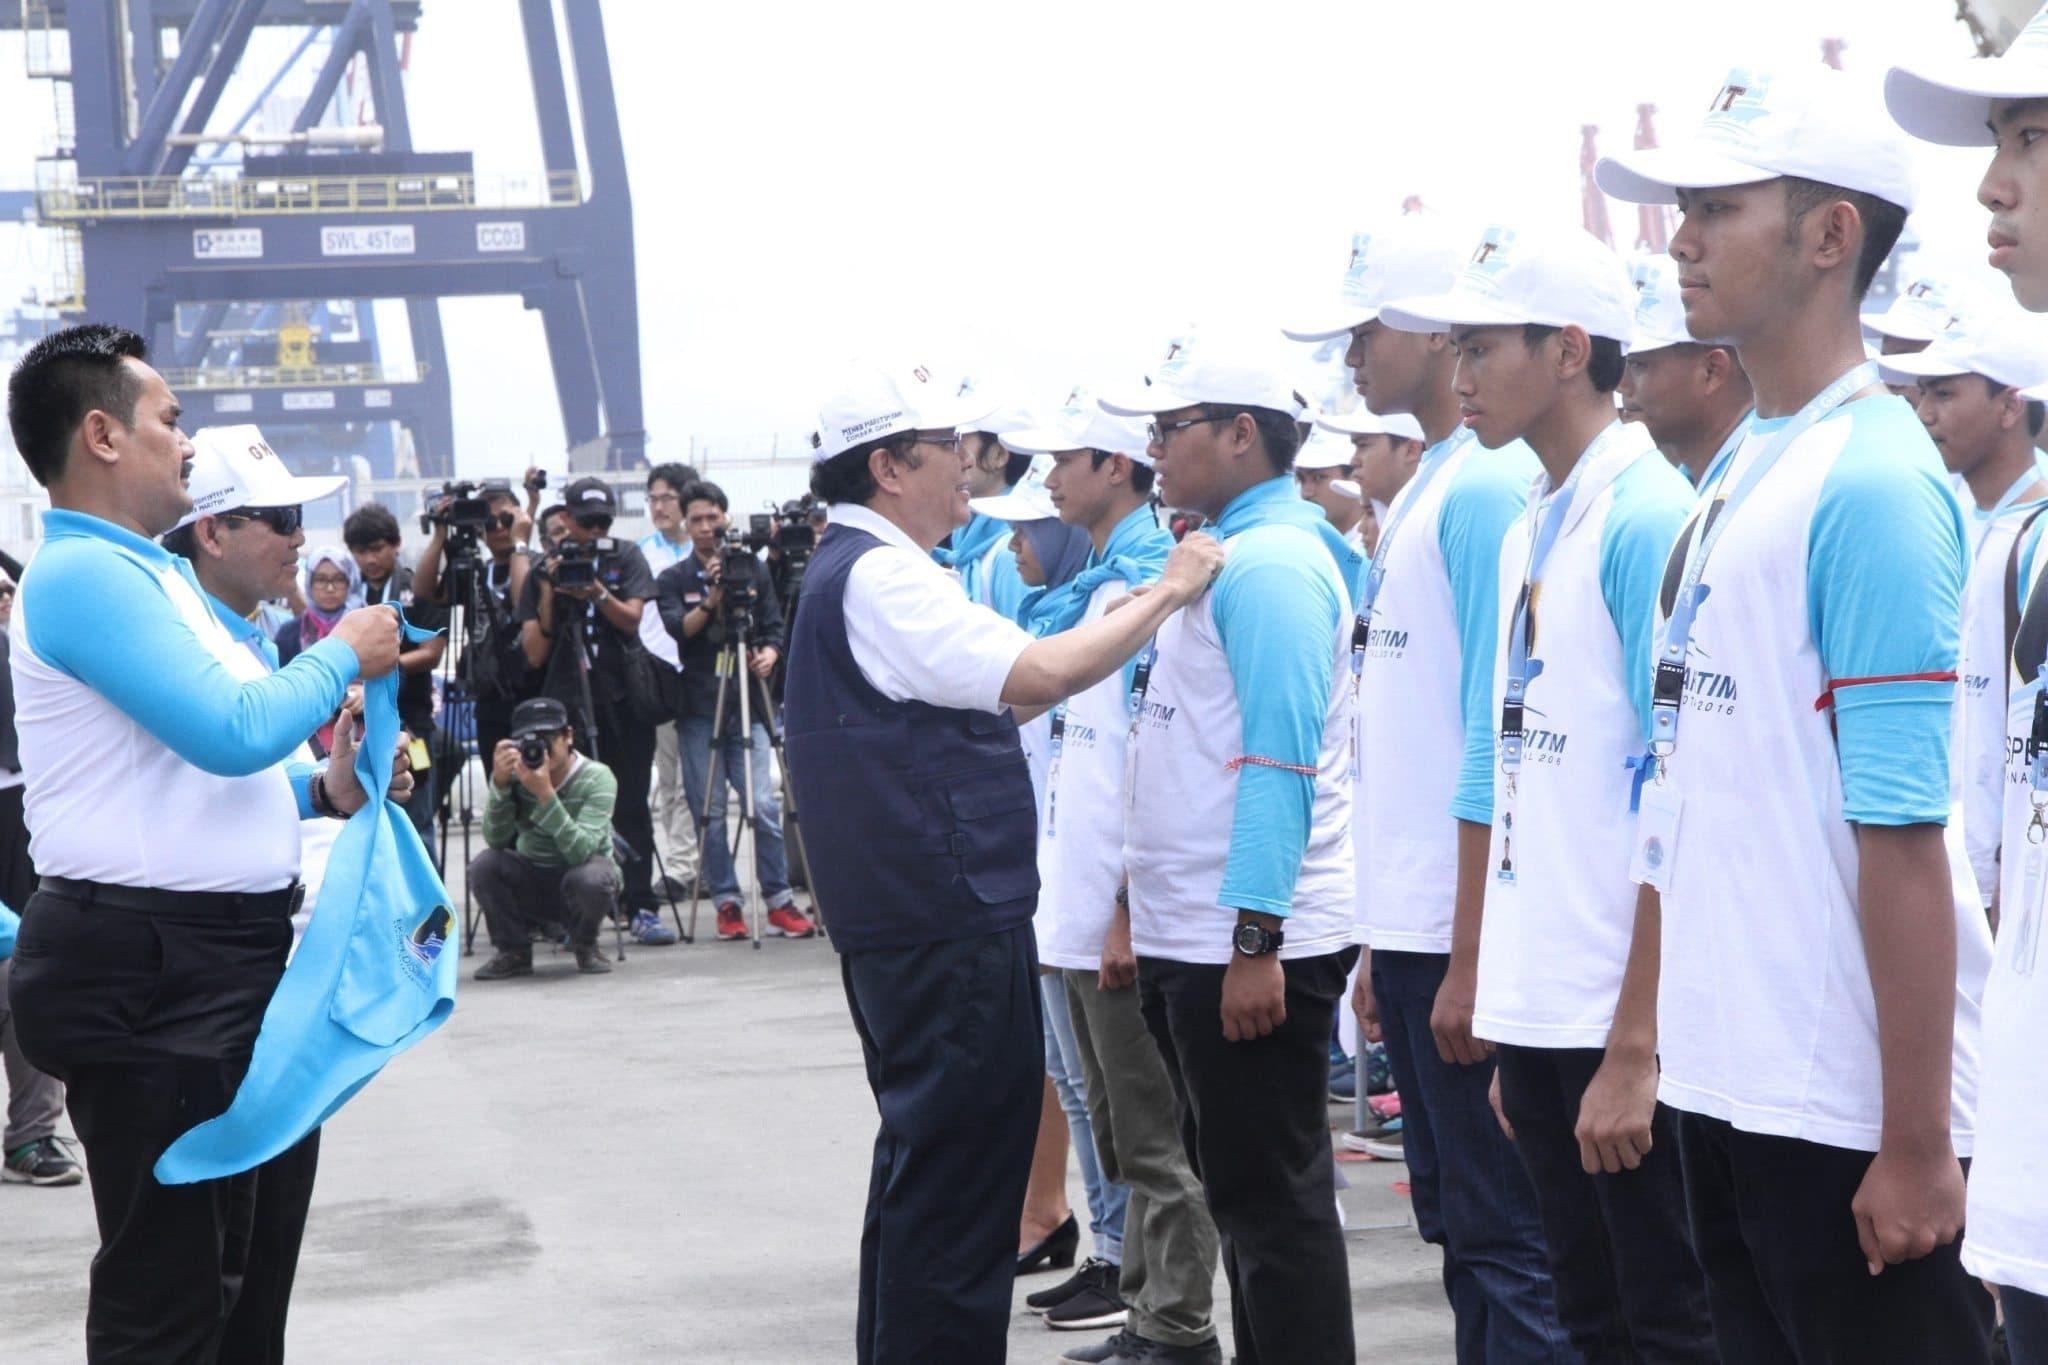 Menko Rizal Melepas Peserta Ekspedisi Maritim GMT 2016